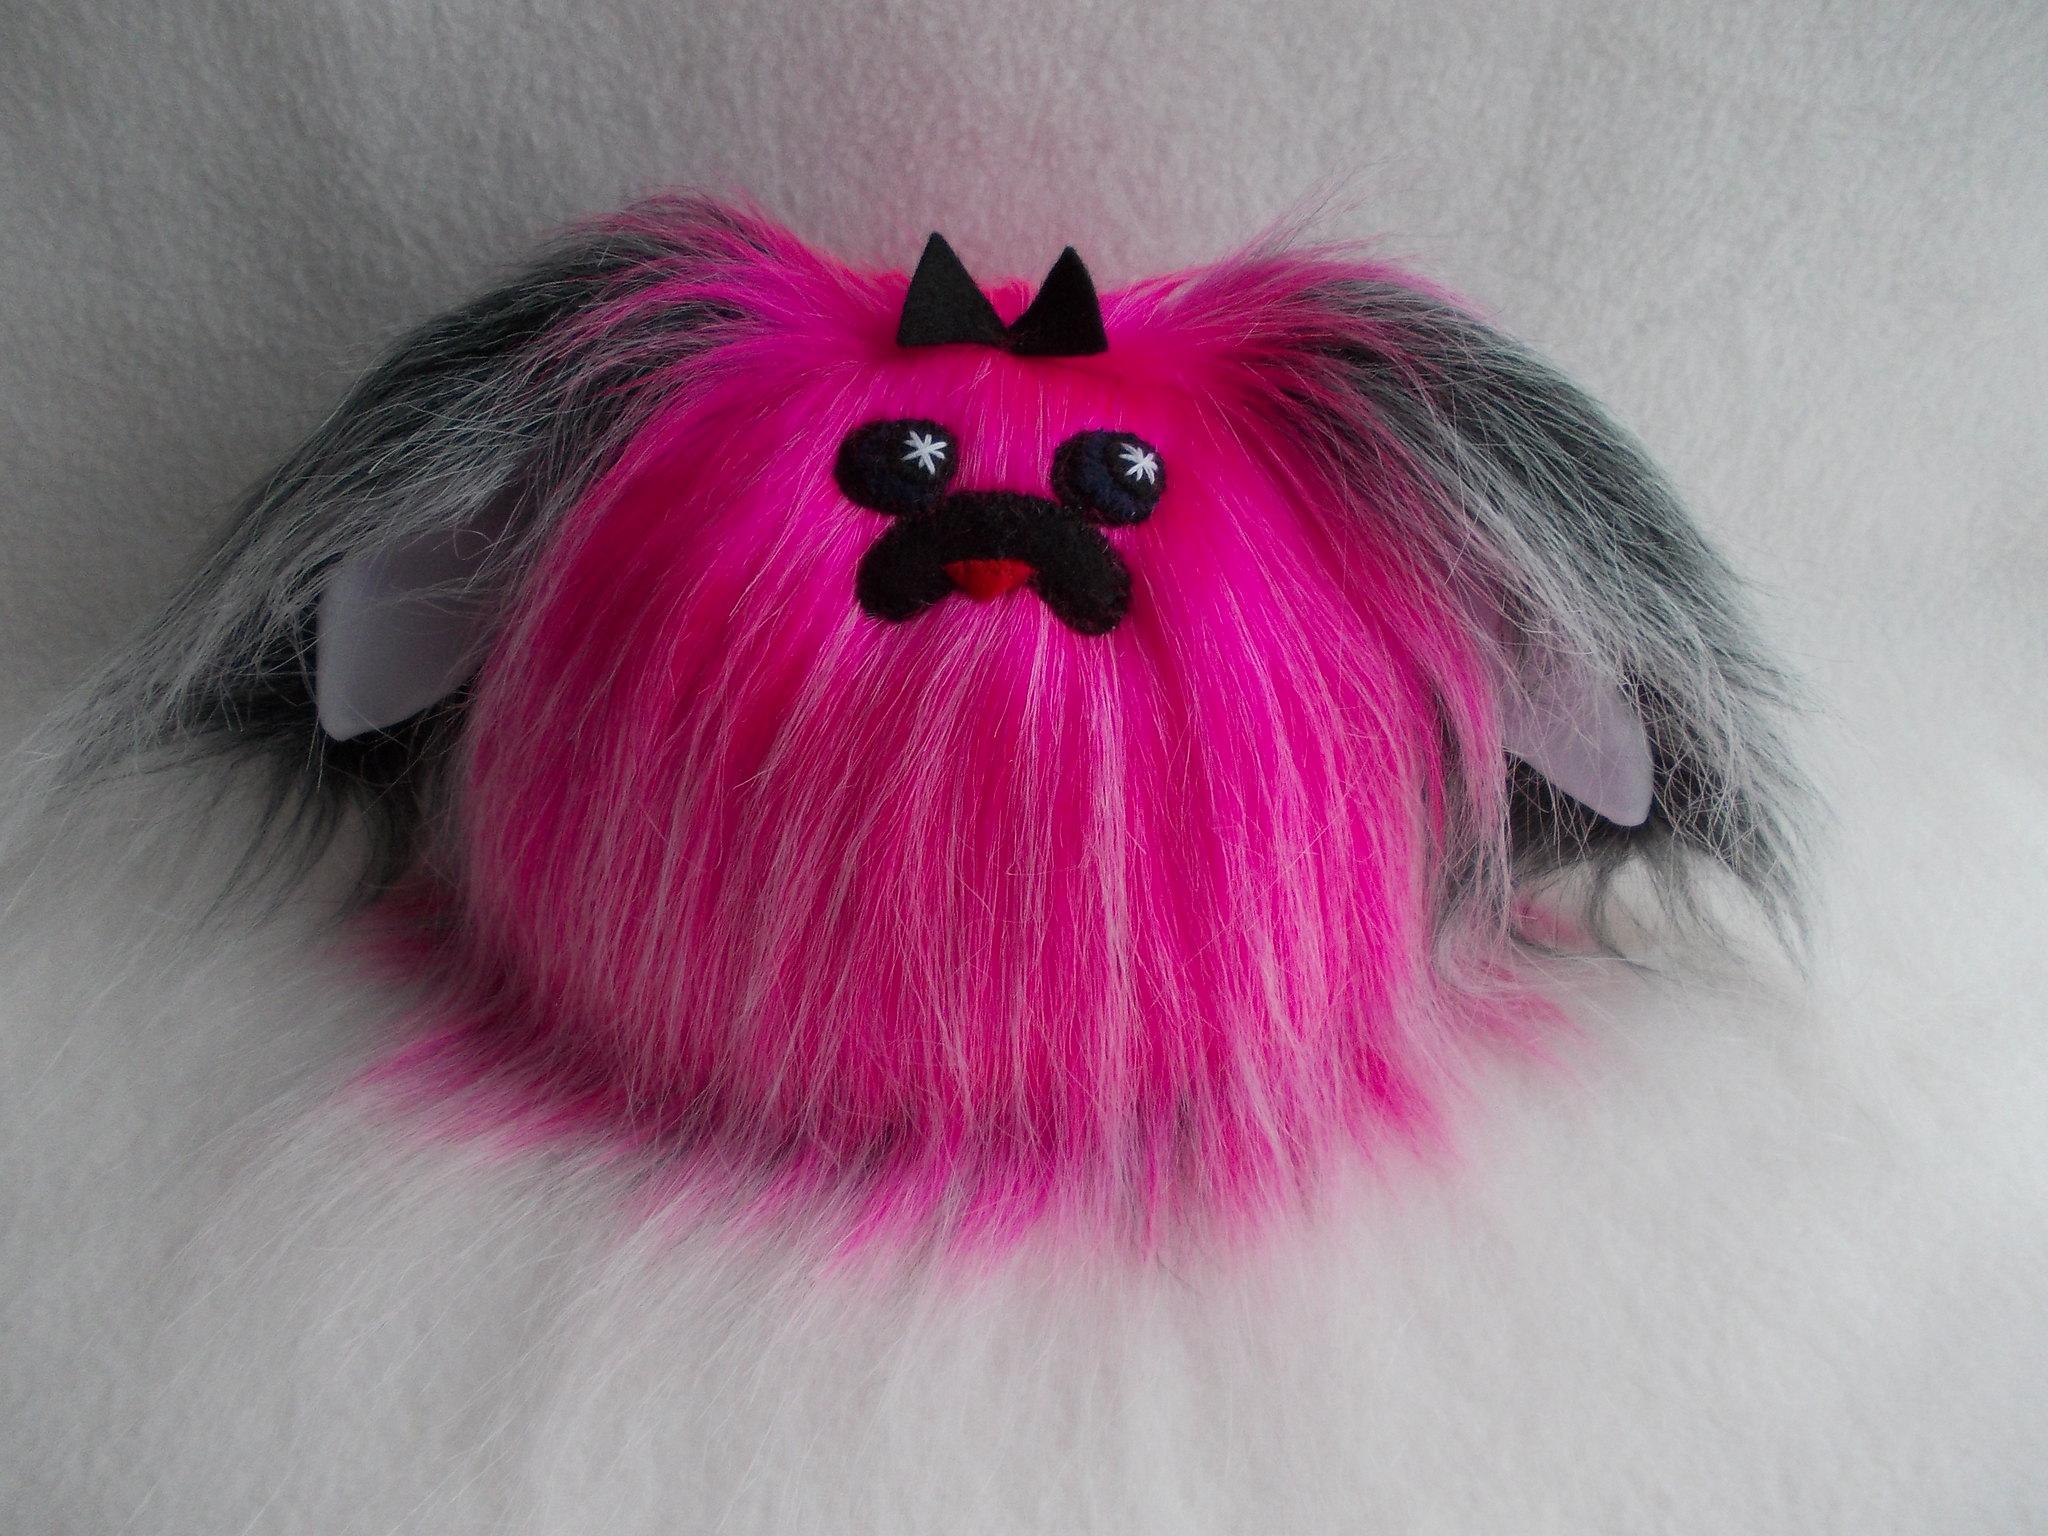 Pink Black small dog, plush toy, stuffed animal, kawaii plushies, fluffy dog, little  childrens handmade toy 100